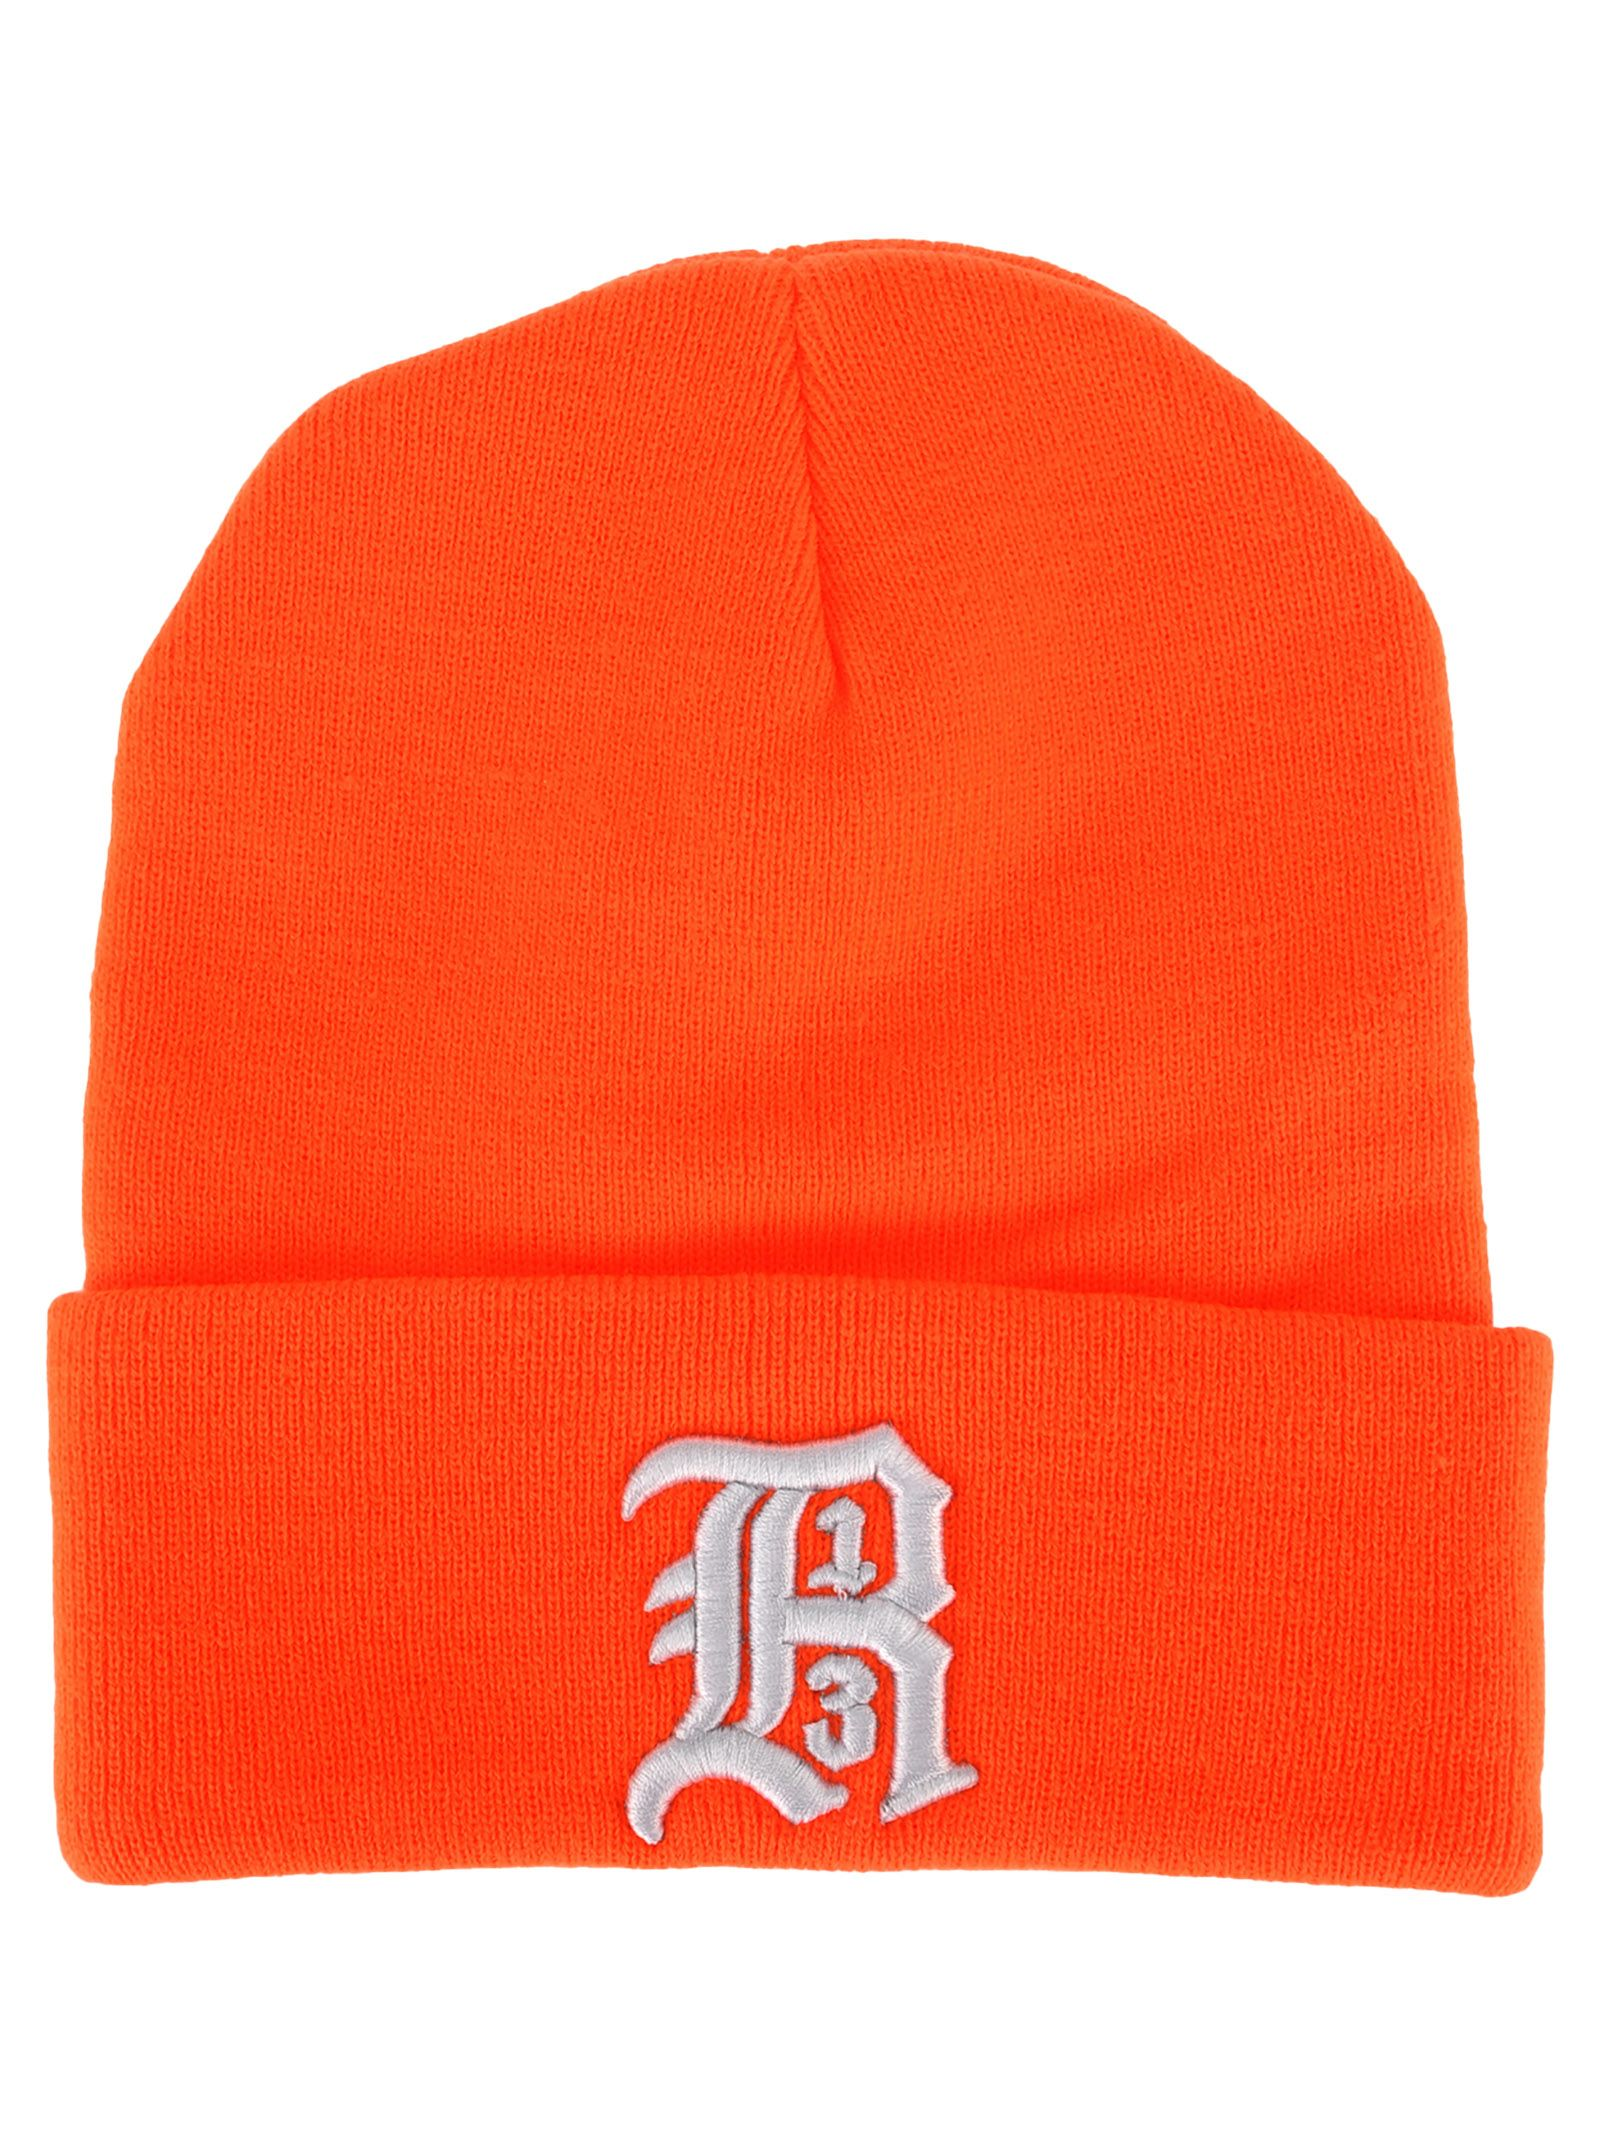 R13 Hats HAT